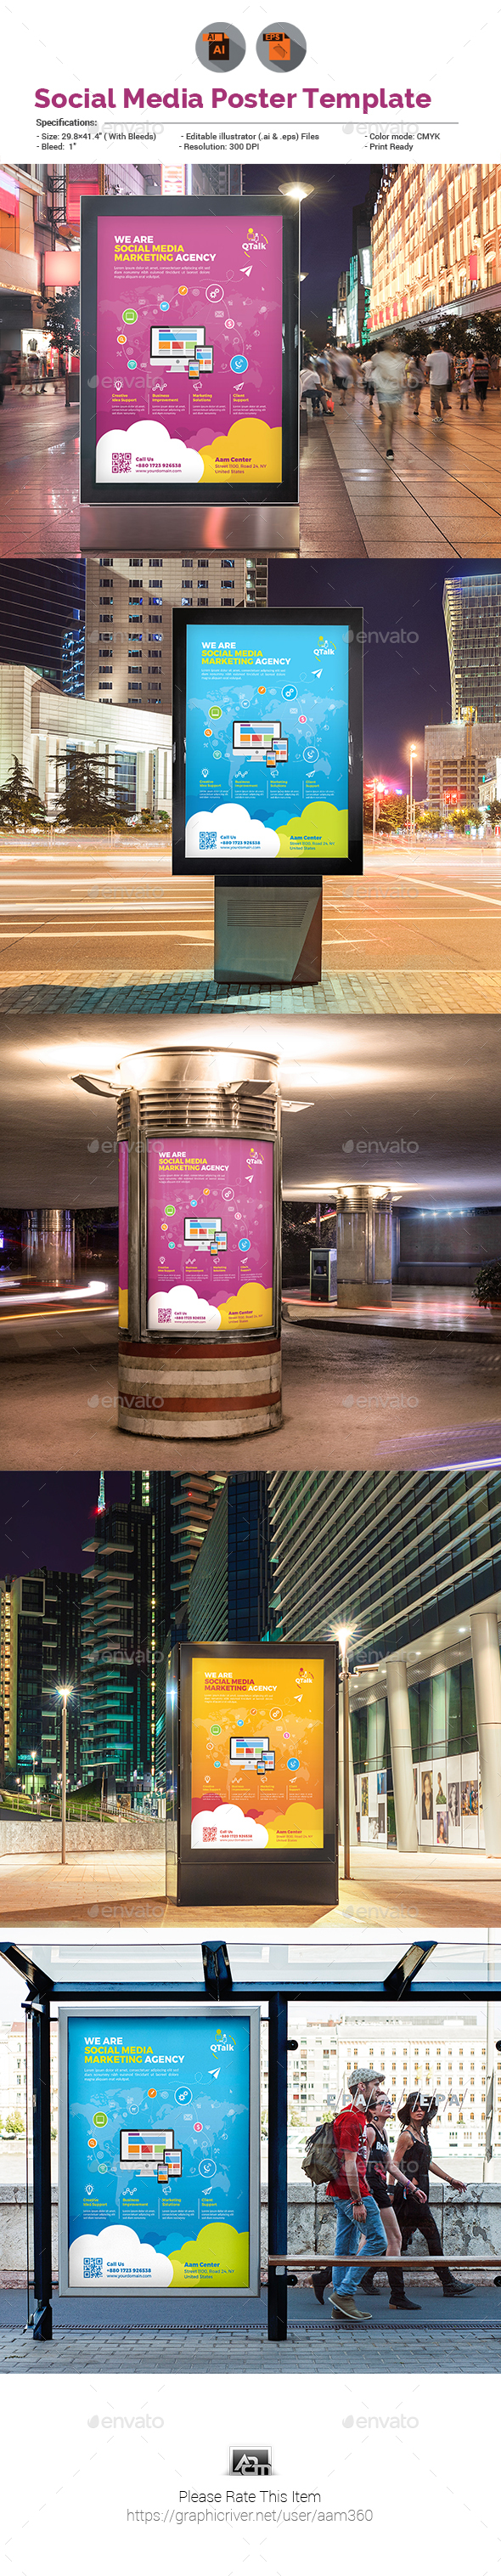 Social Media Marketing Poster - Signage Print Templates